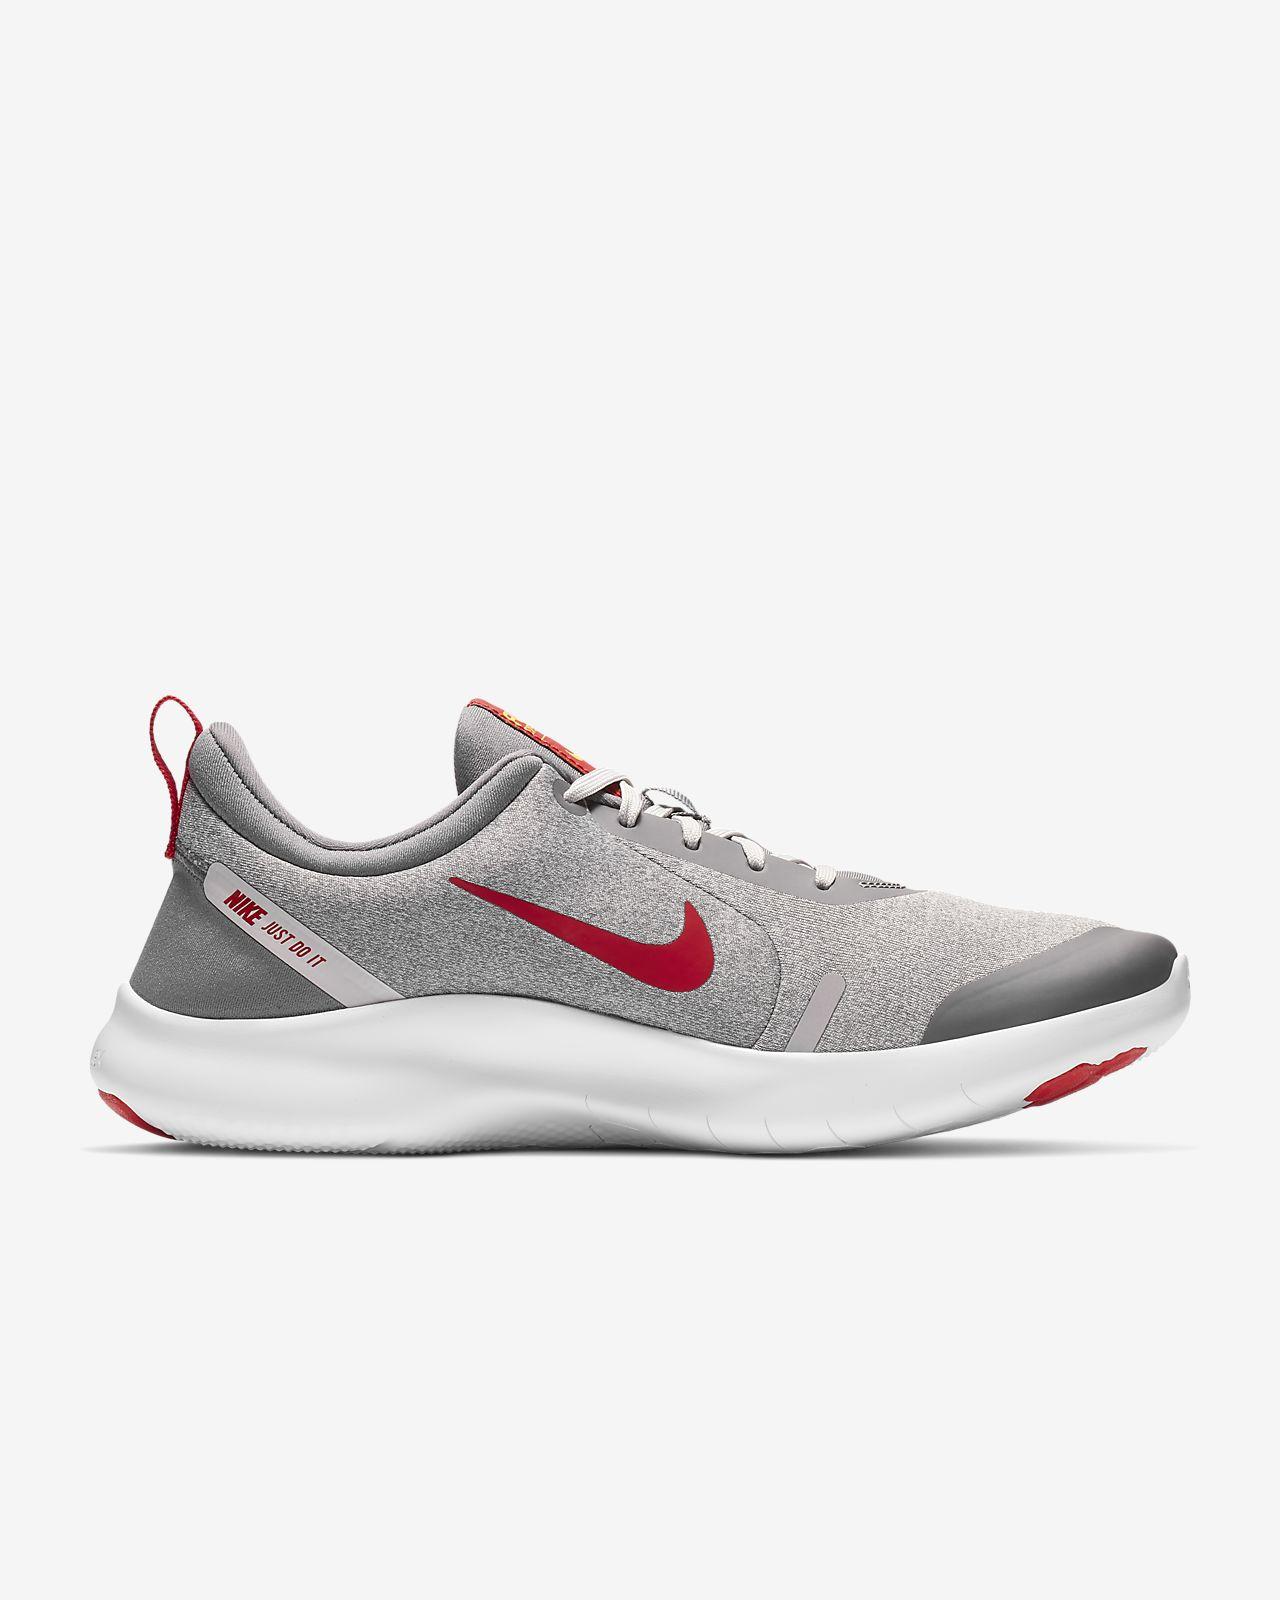 9b1d2314b3c1 Nike Flex Experience RN 8 Men s Running Shoe. Nike.com ZA